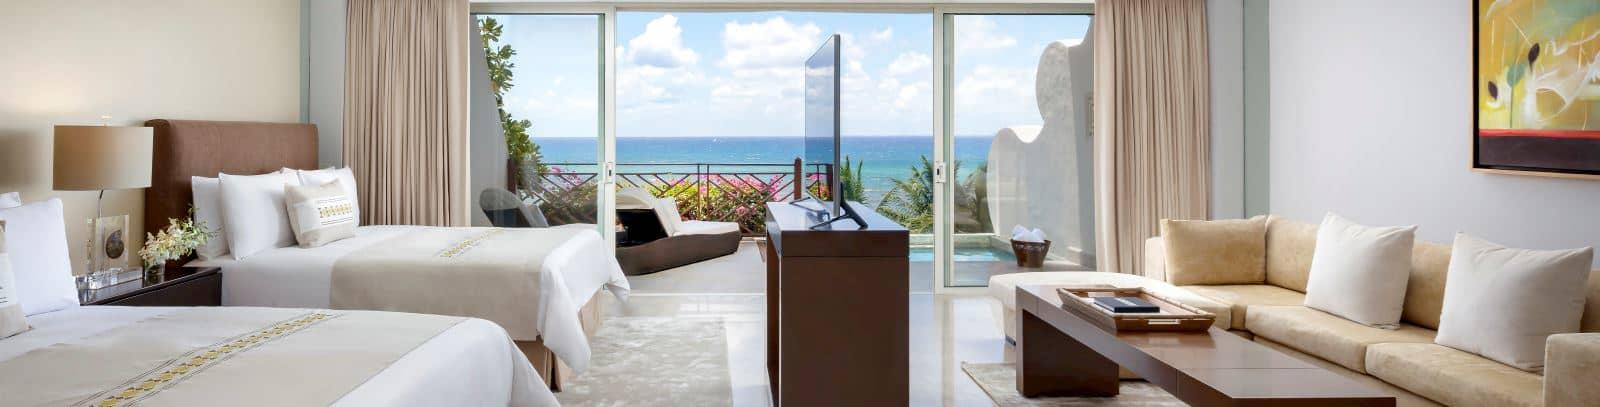 Suites en Grand Velas Riviera Maya